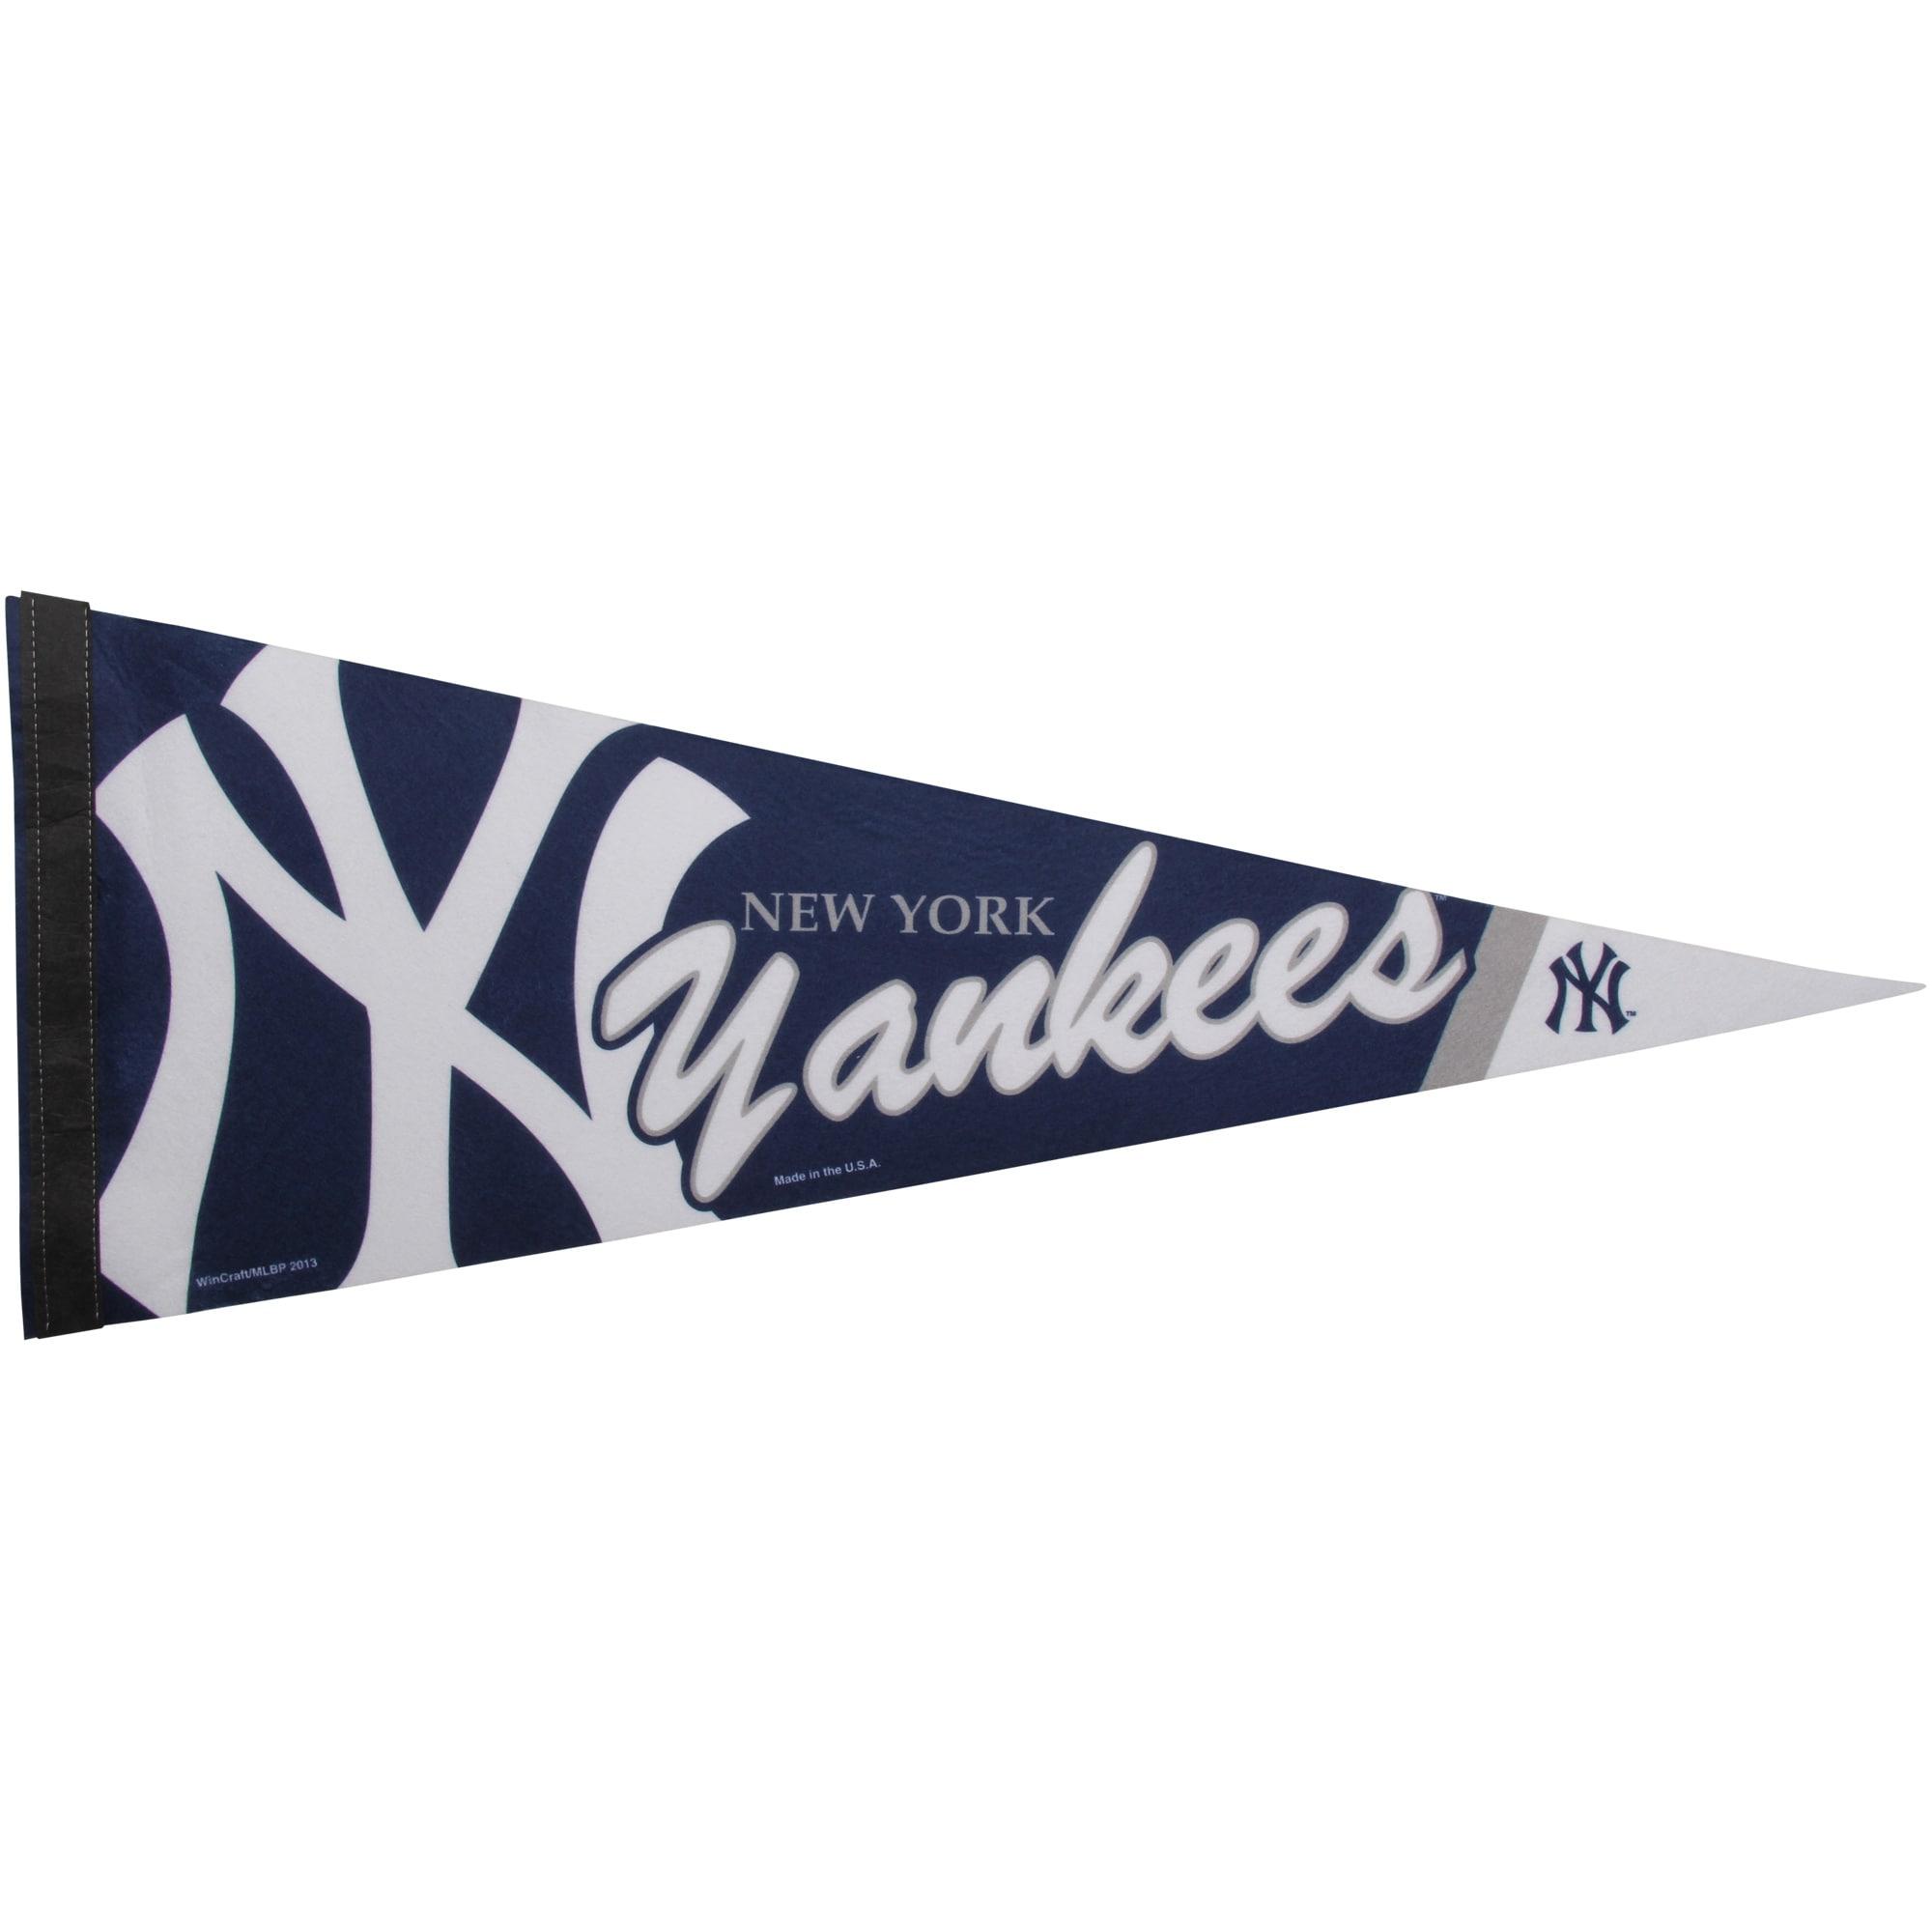 "New York Yankees WinCraft 12"" x 30"" Premium Pennant"